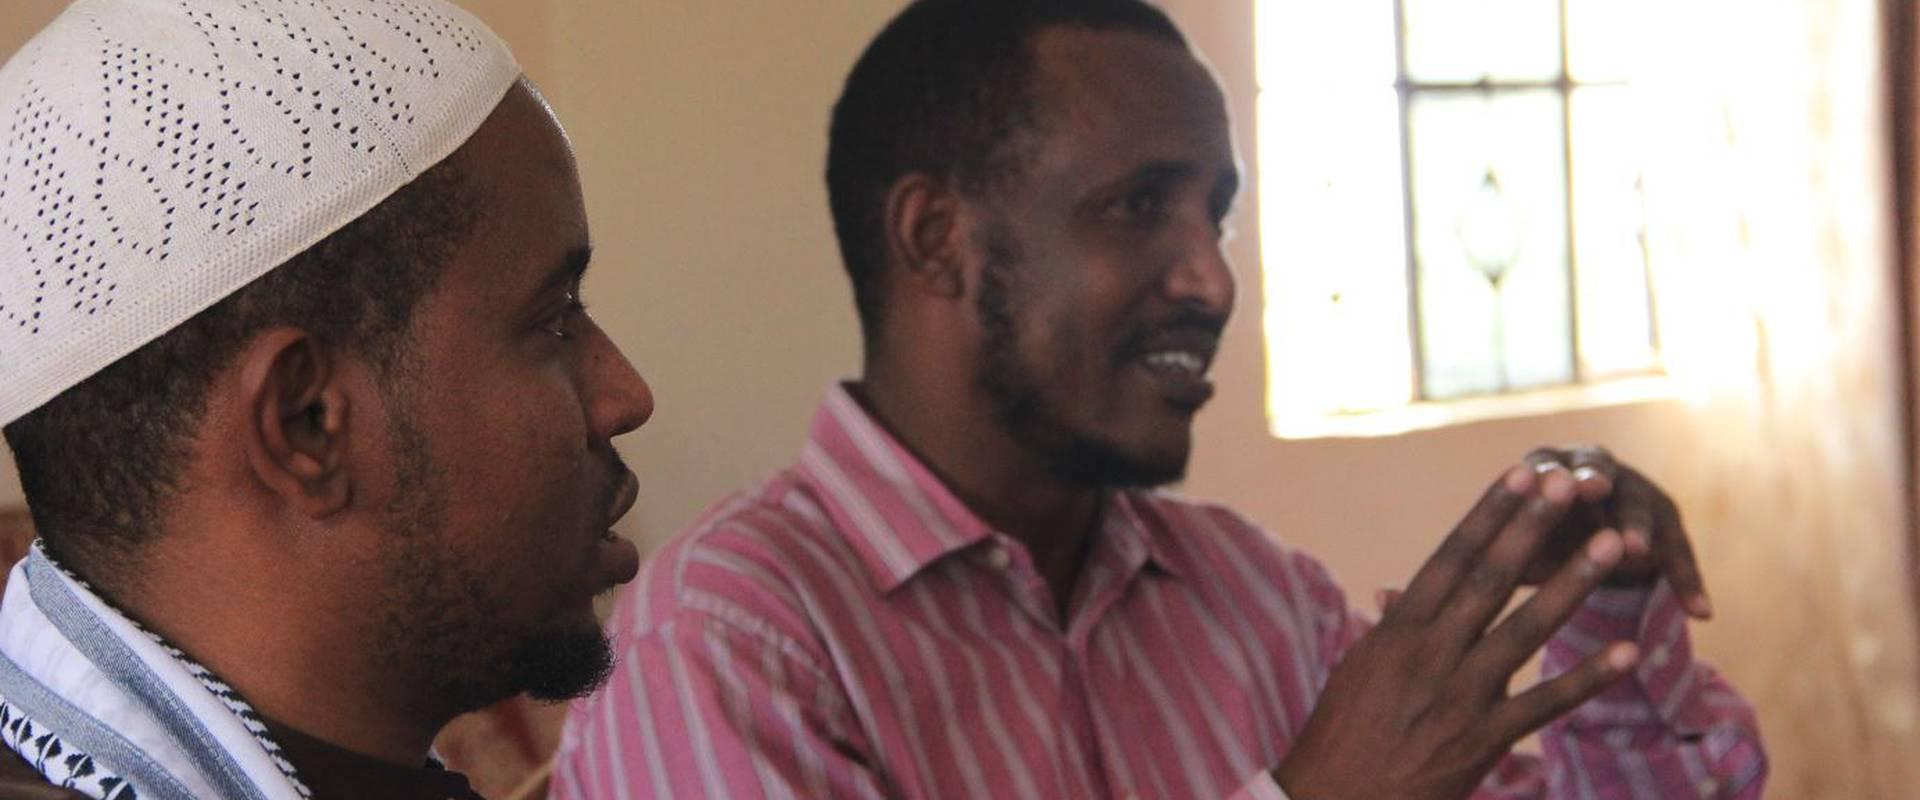 HIV/aids dating sites Keniassa vapaa homo dating rungosta